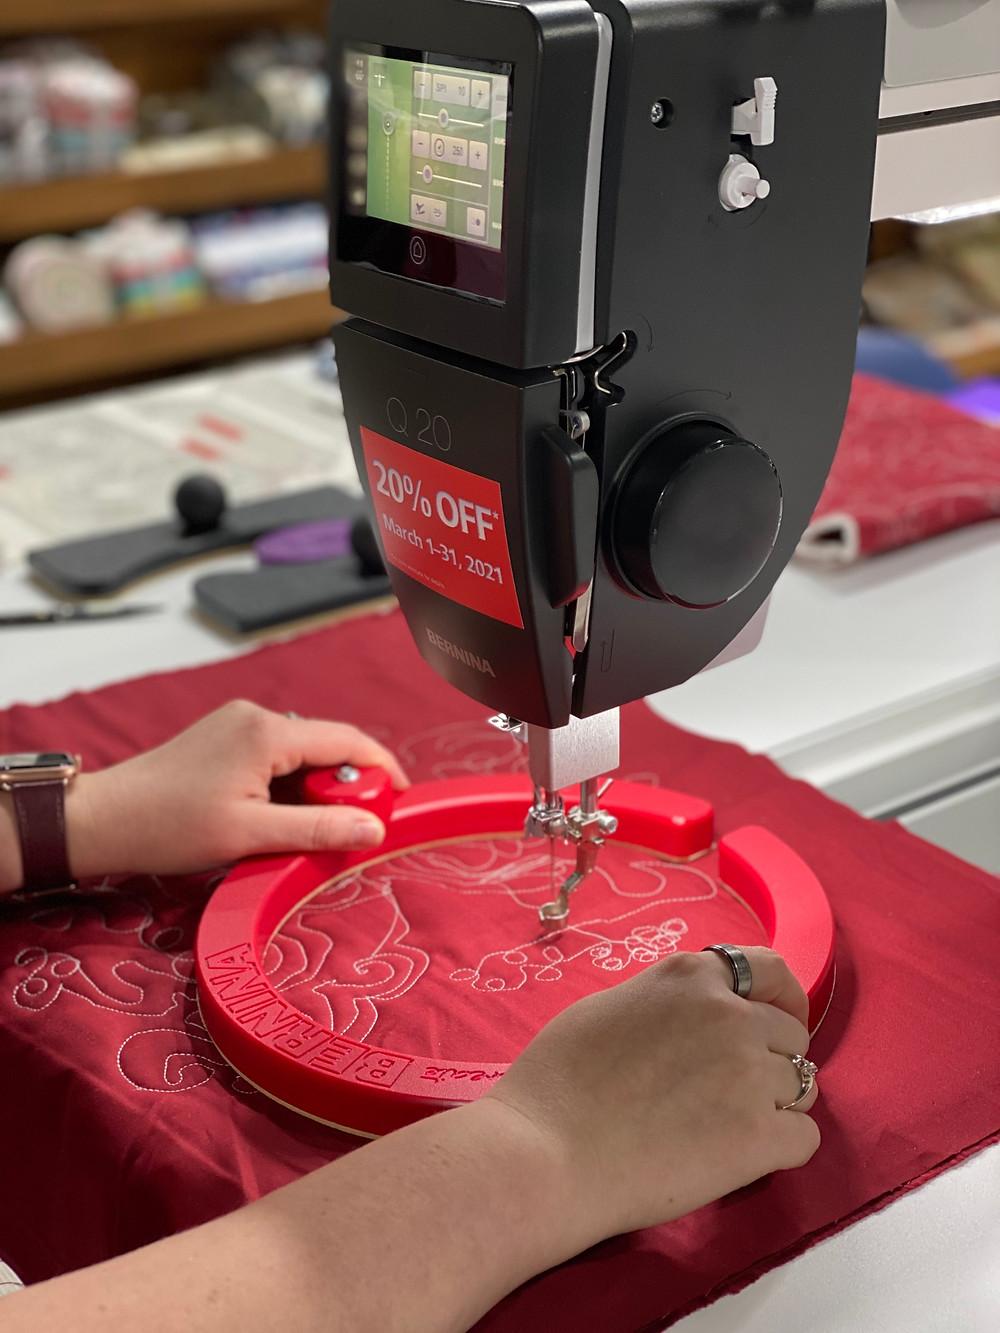 Reasons to Use Bernina Sewing Machines